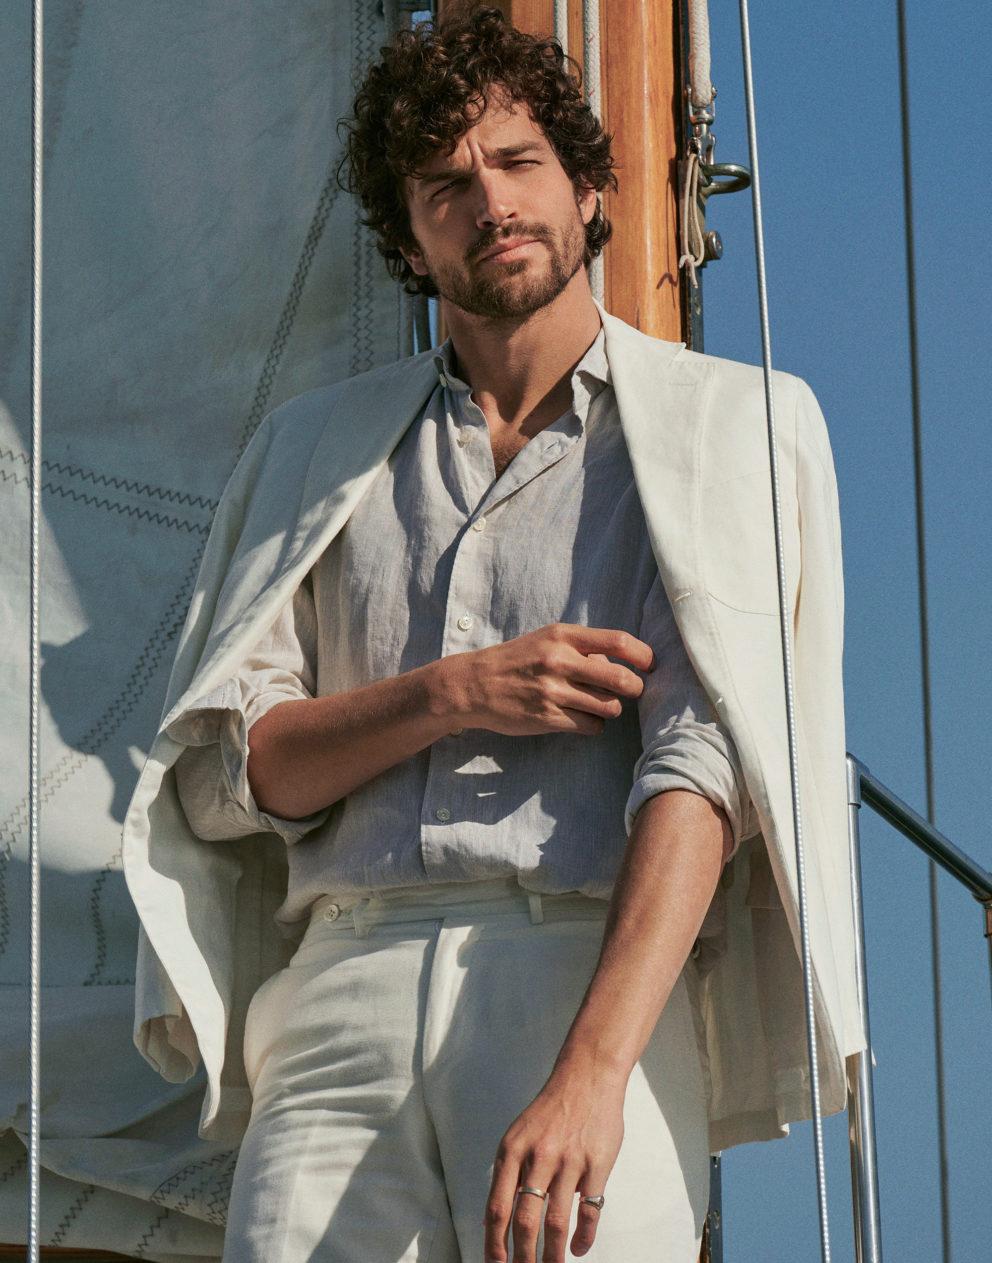 210319 0050 Eton Shirts Sailing La 441